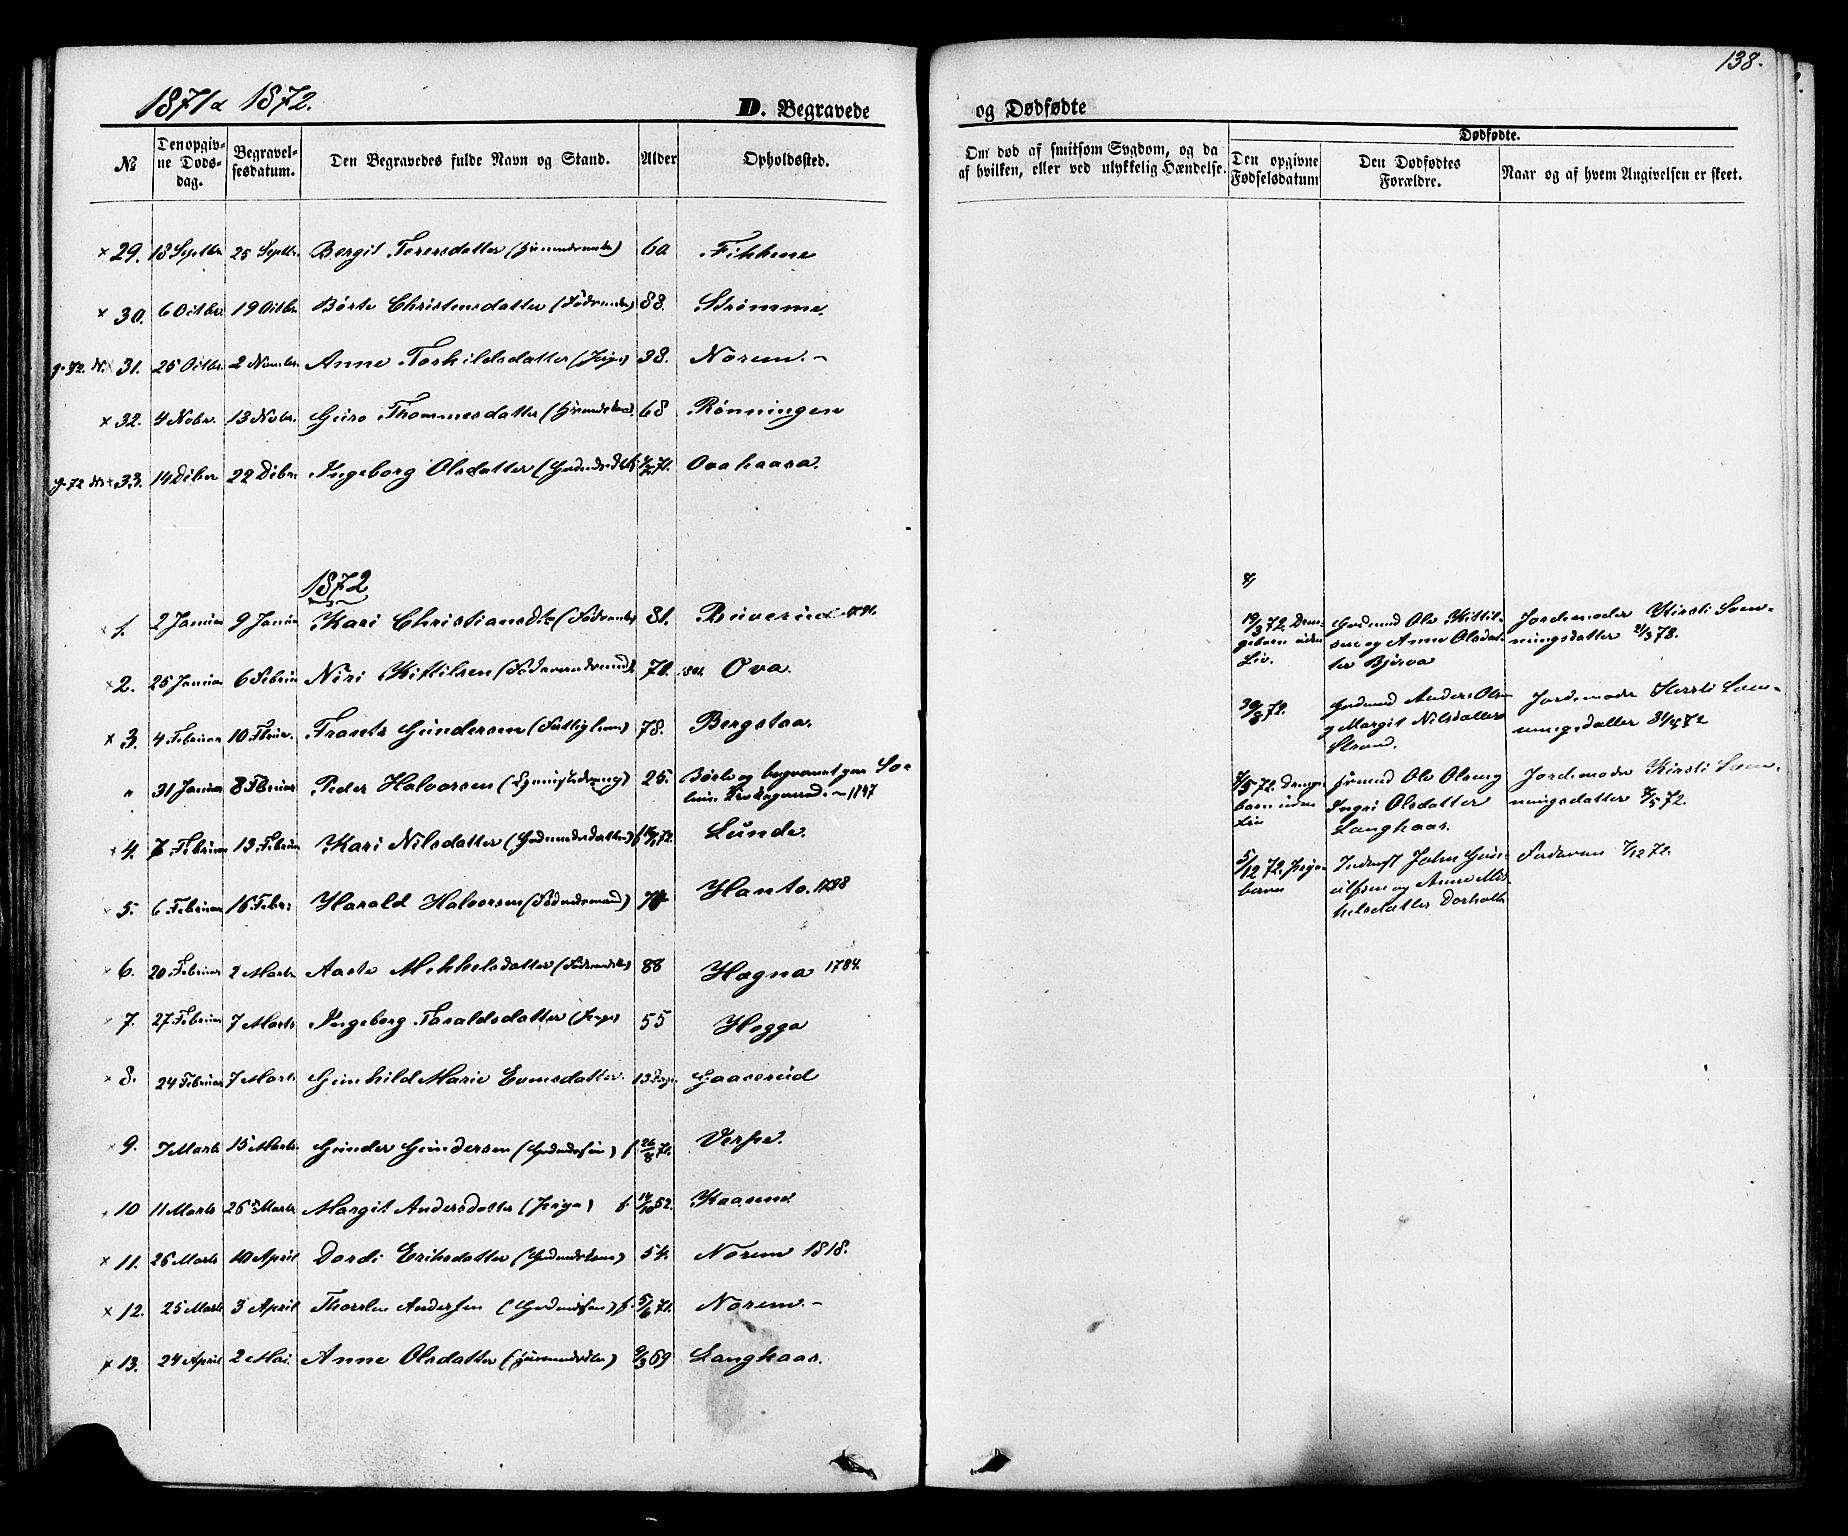 SAKO, Lunde kirkebøker, F/Fa/L0001: Ministerialbok nr. I 1, 1866-1883, s. 138